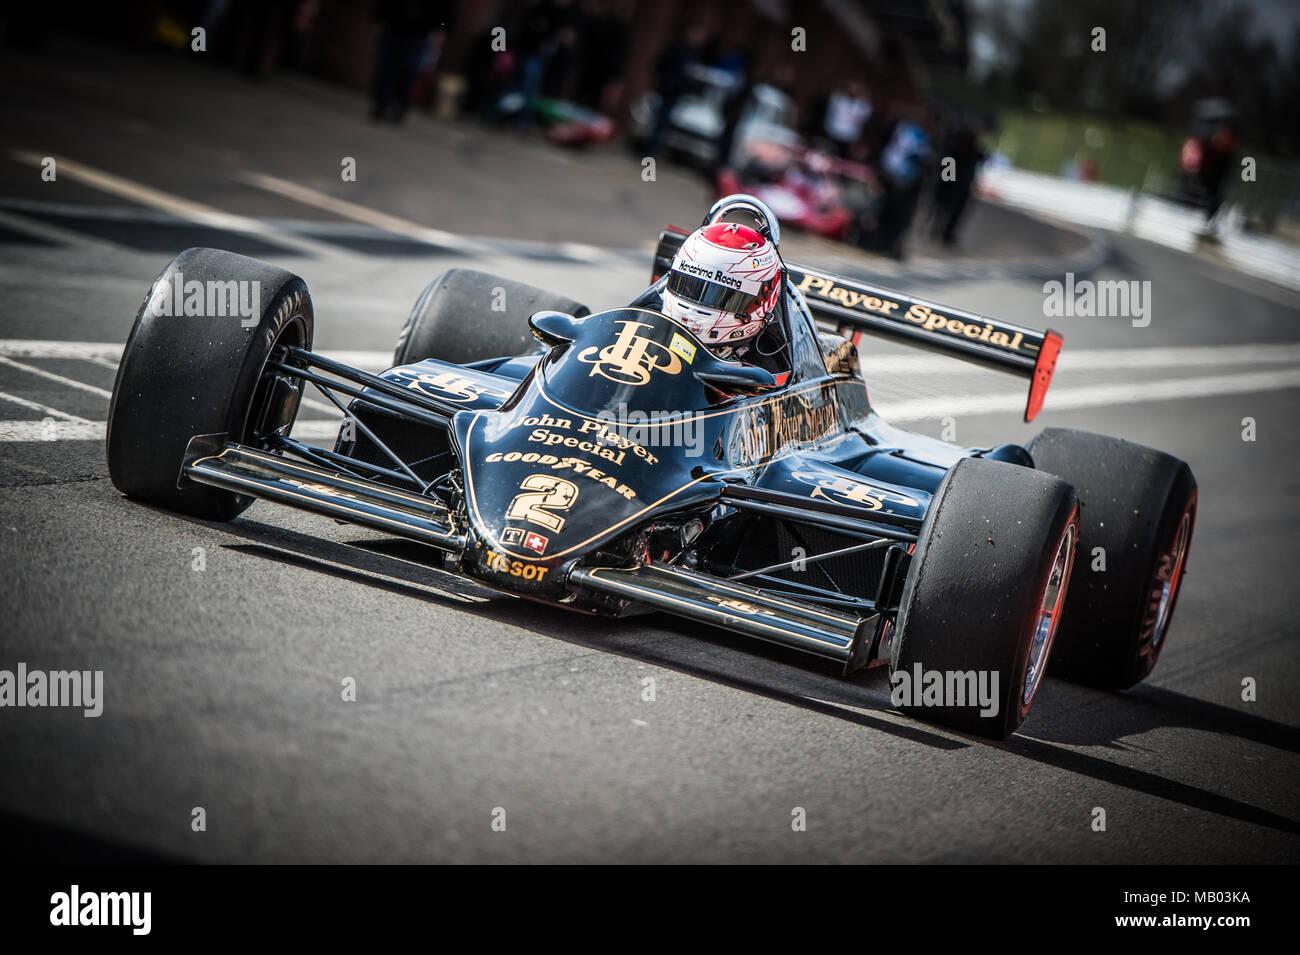 Japanese racing driver Katsu Kubota in the JPS Lotus 91/7 F1 car during the Master Historic Racing Test Day at Brands Hatch Circuit - Stock Image